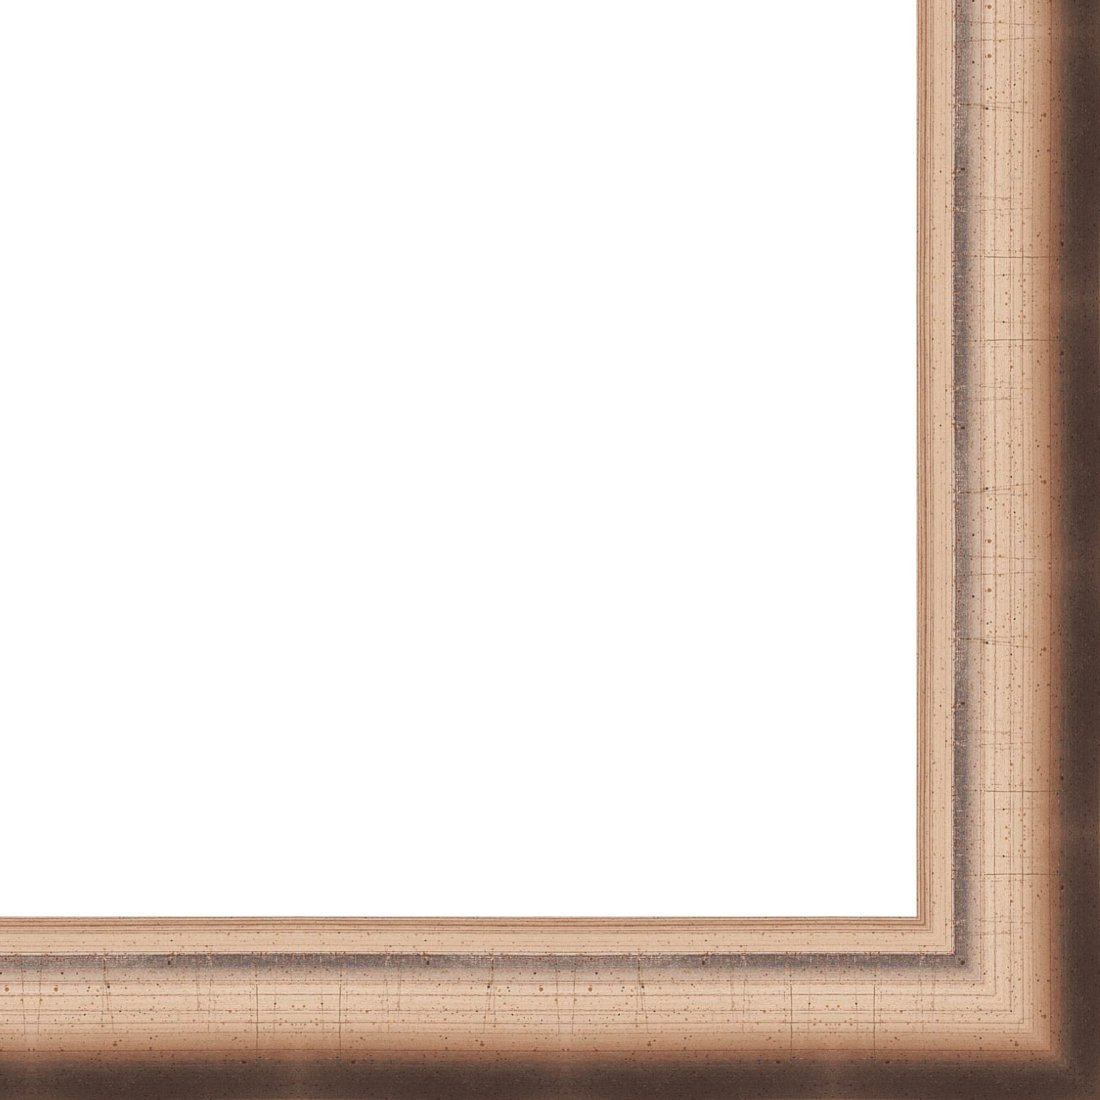 Picture Frame Moulding (Wood) 18ft bundle - Contemporary Antique Silver Finish - 1.25'' width - 3/4'' rabbet depth